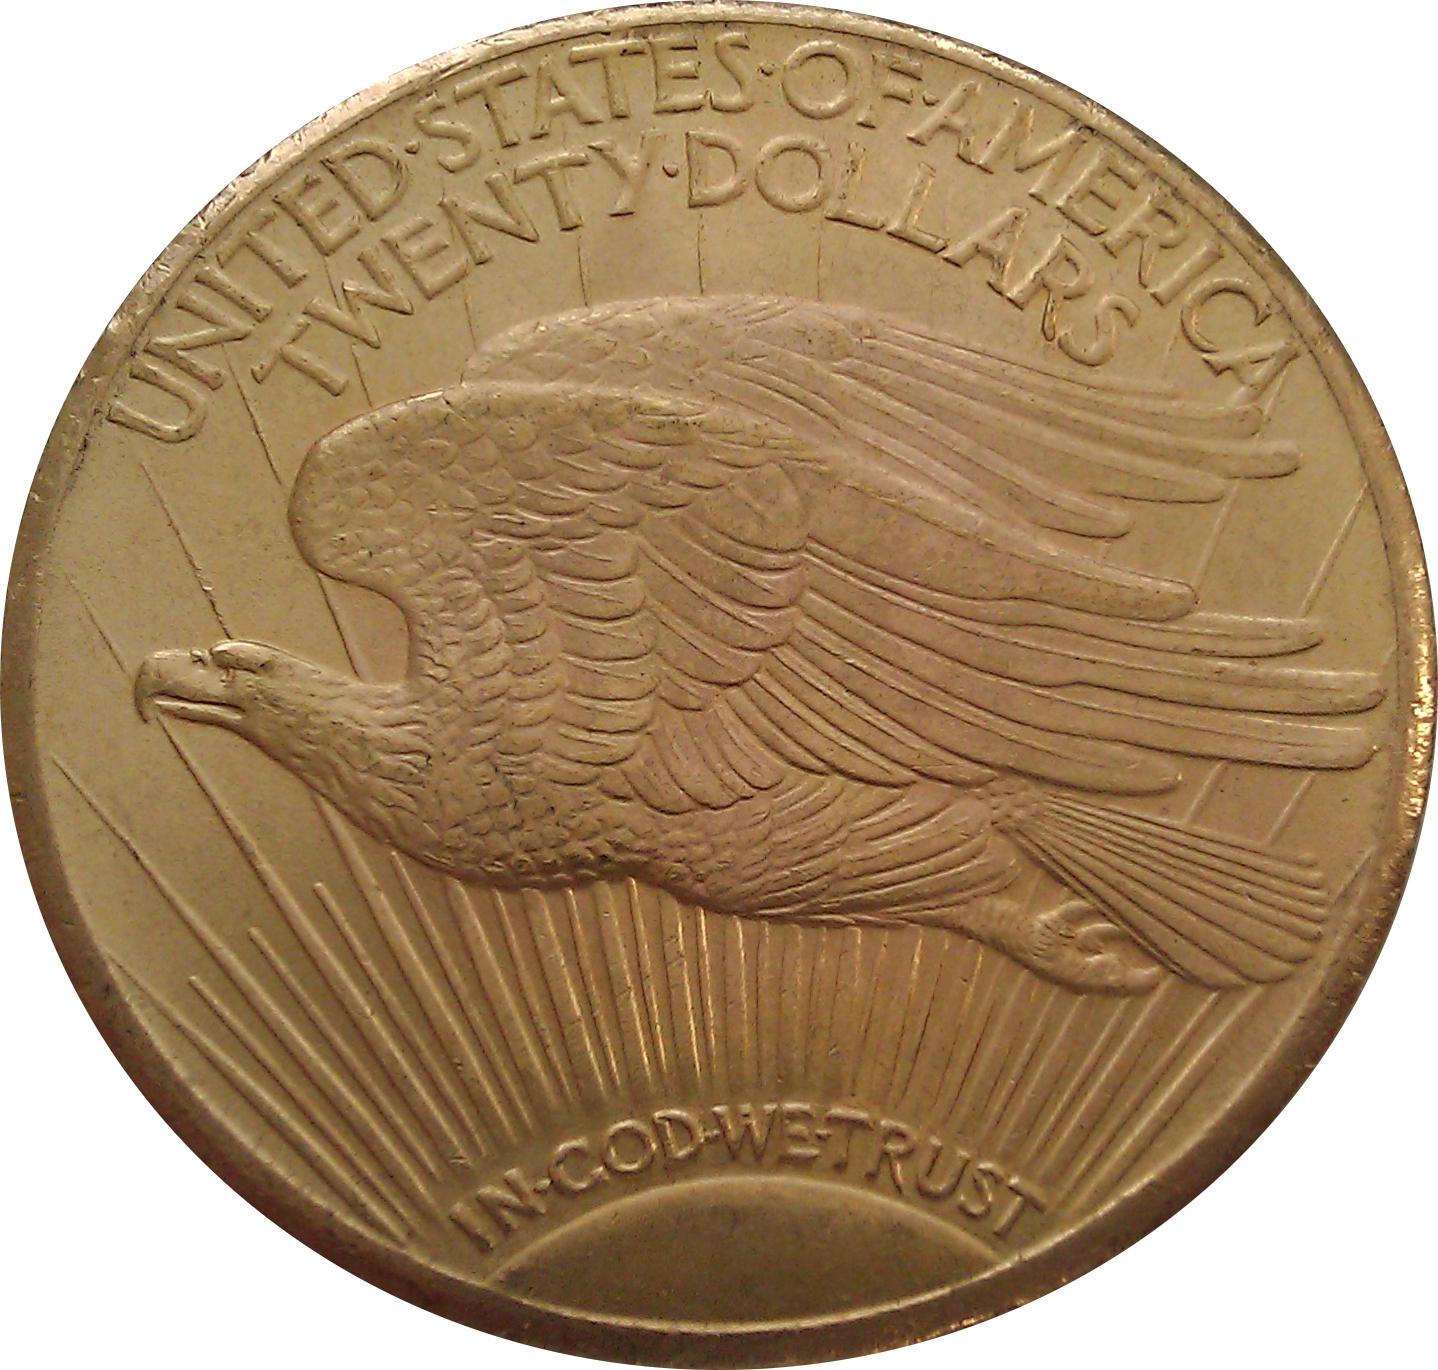 gold silver bullion for sale platinum palladium coins autos weblog. Black Bedroom Furniture Sets. Home Design Ideas